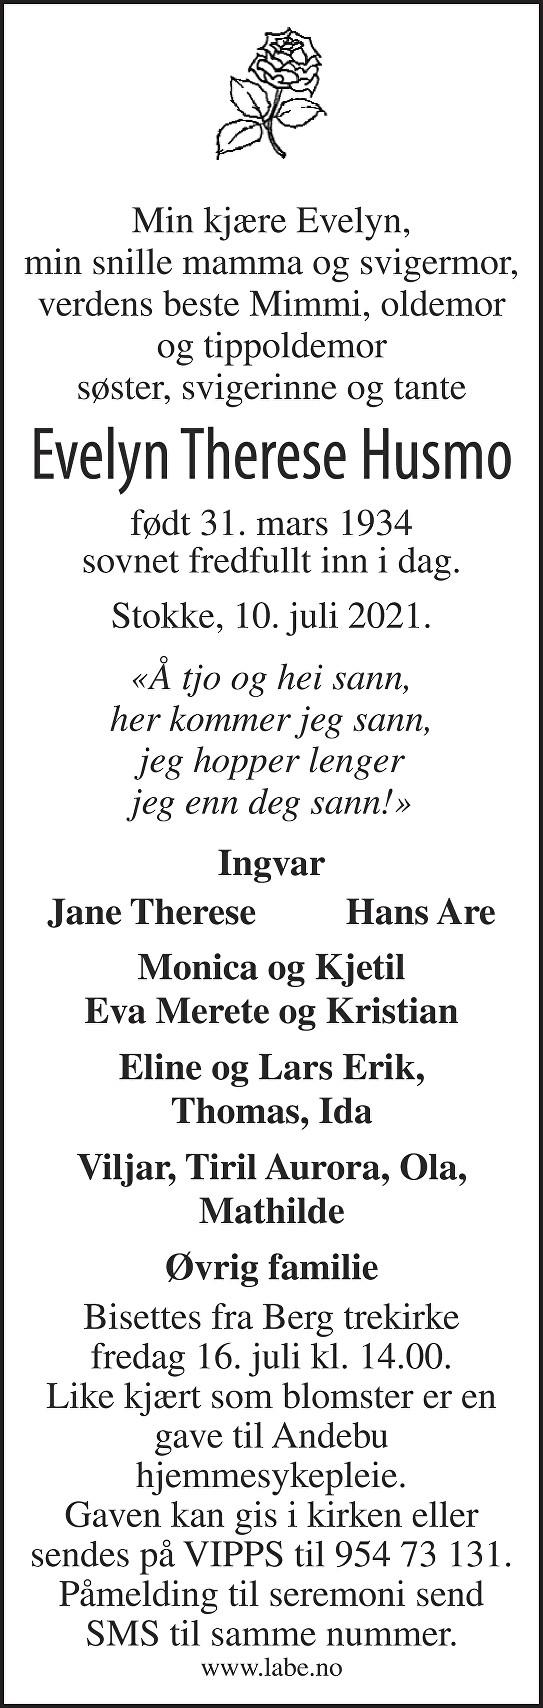 Evelyn Therese Husmo Dødsannonse